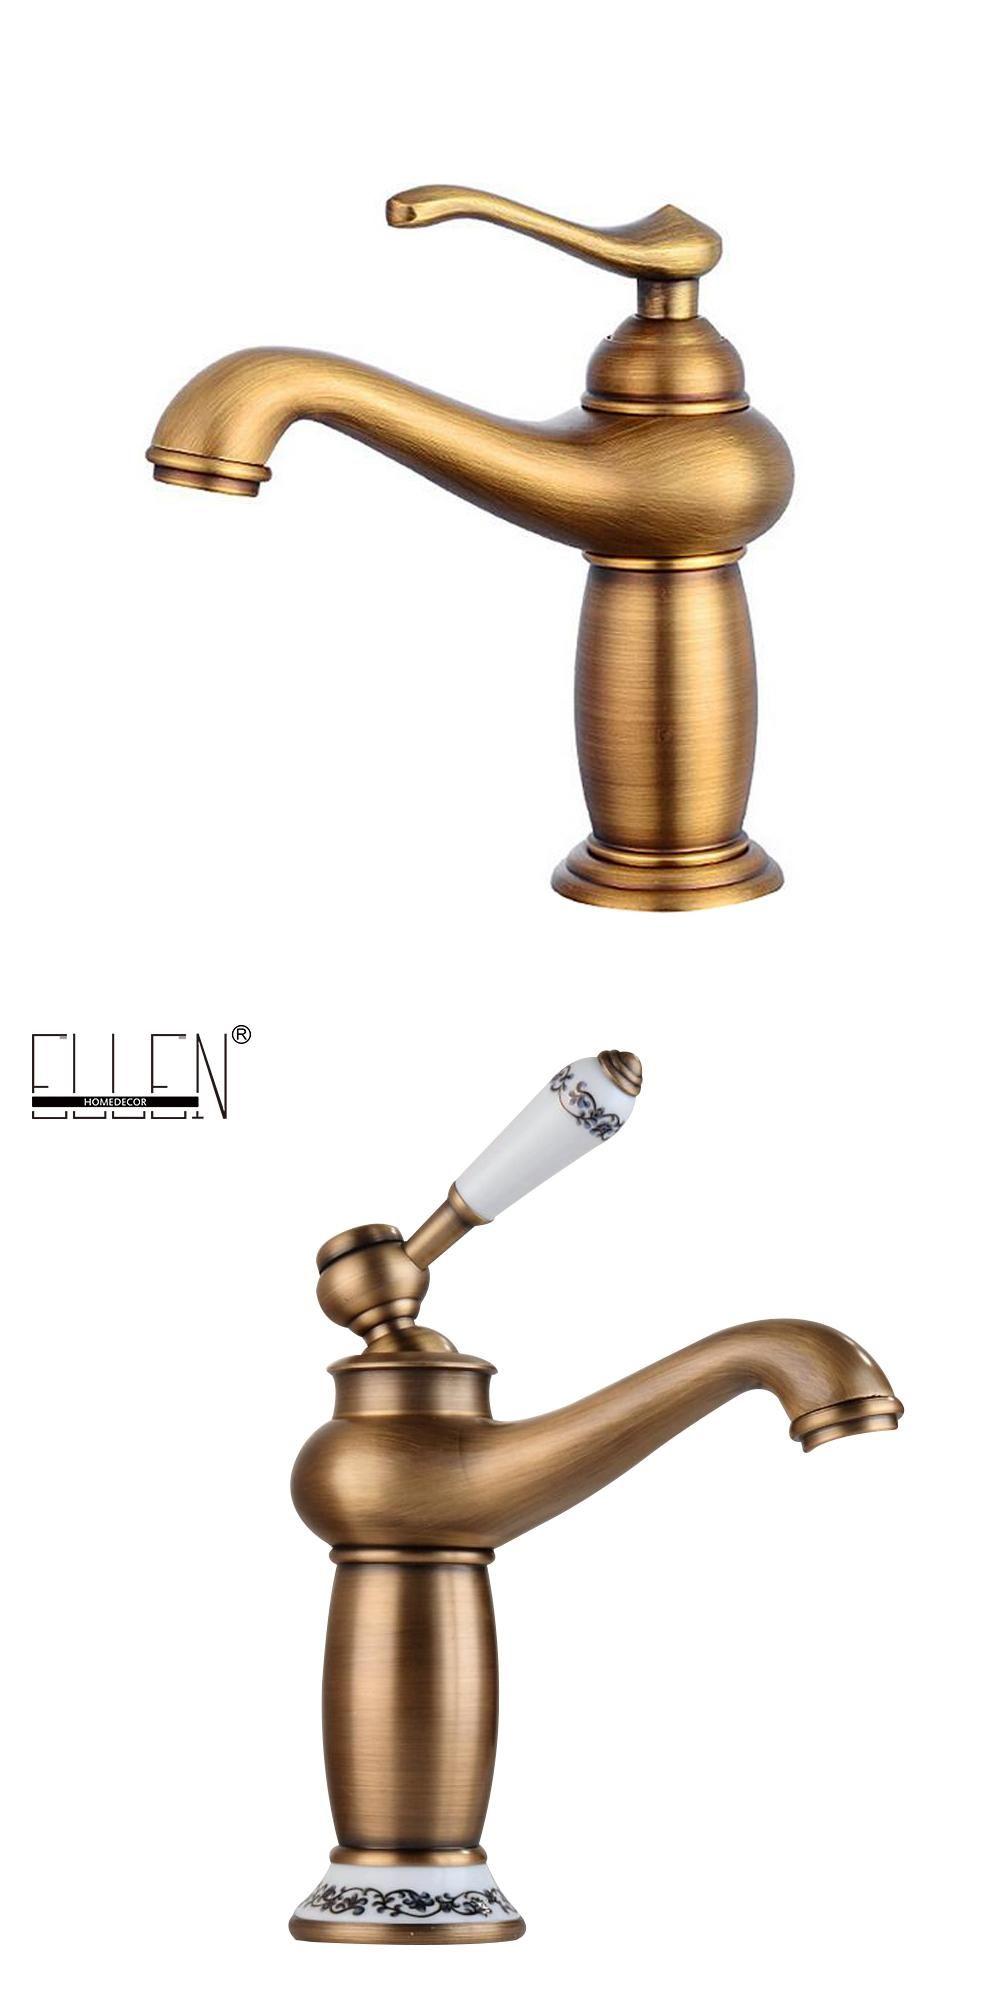 Bathroom Faucet Antique bronze finish Brass Basin Sink Faucet Single ...